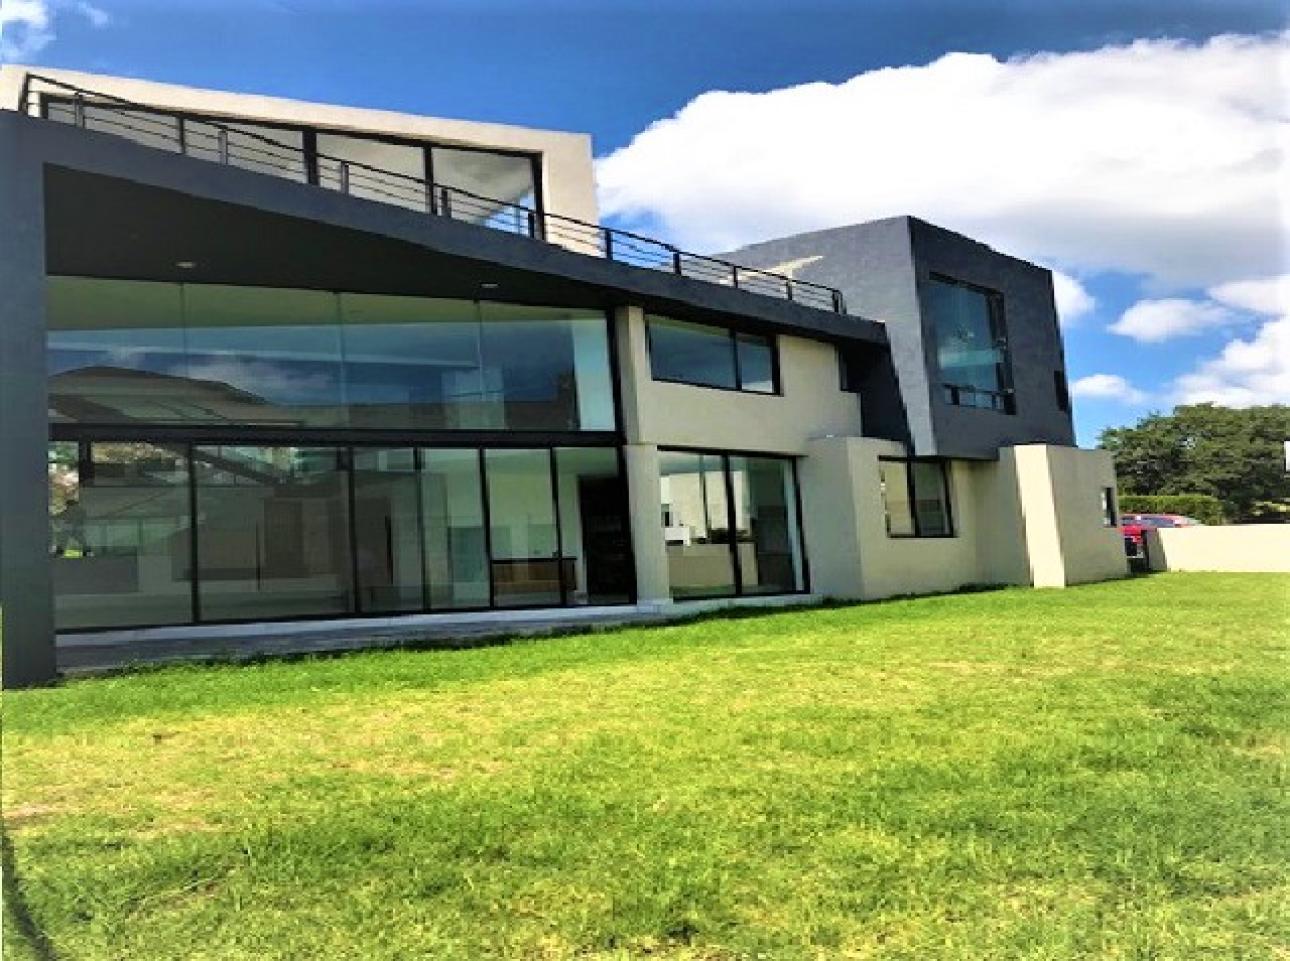 Venta de Casa en Fraccionamiento Lomas de Valle Escondido   Atizapán de Zaragoza